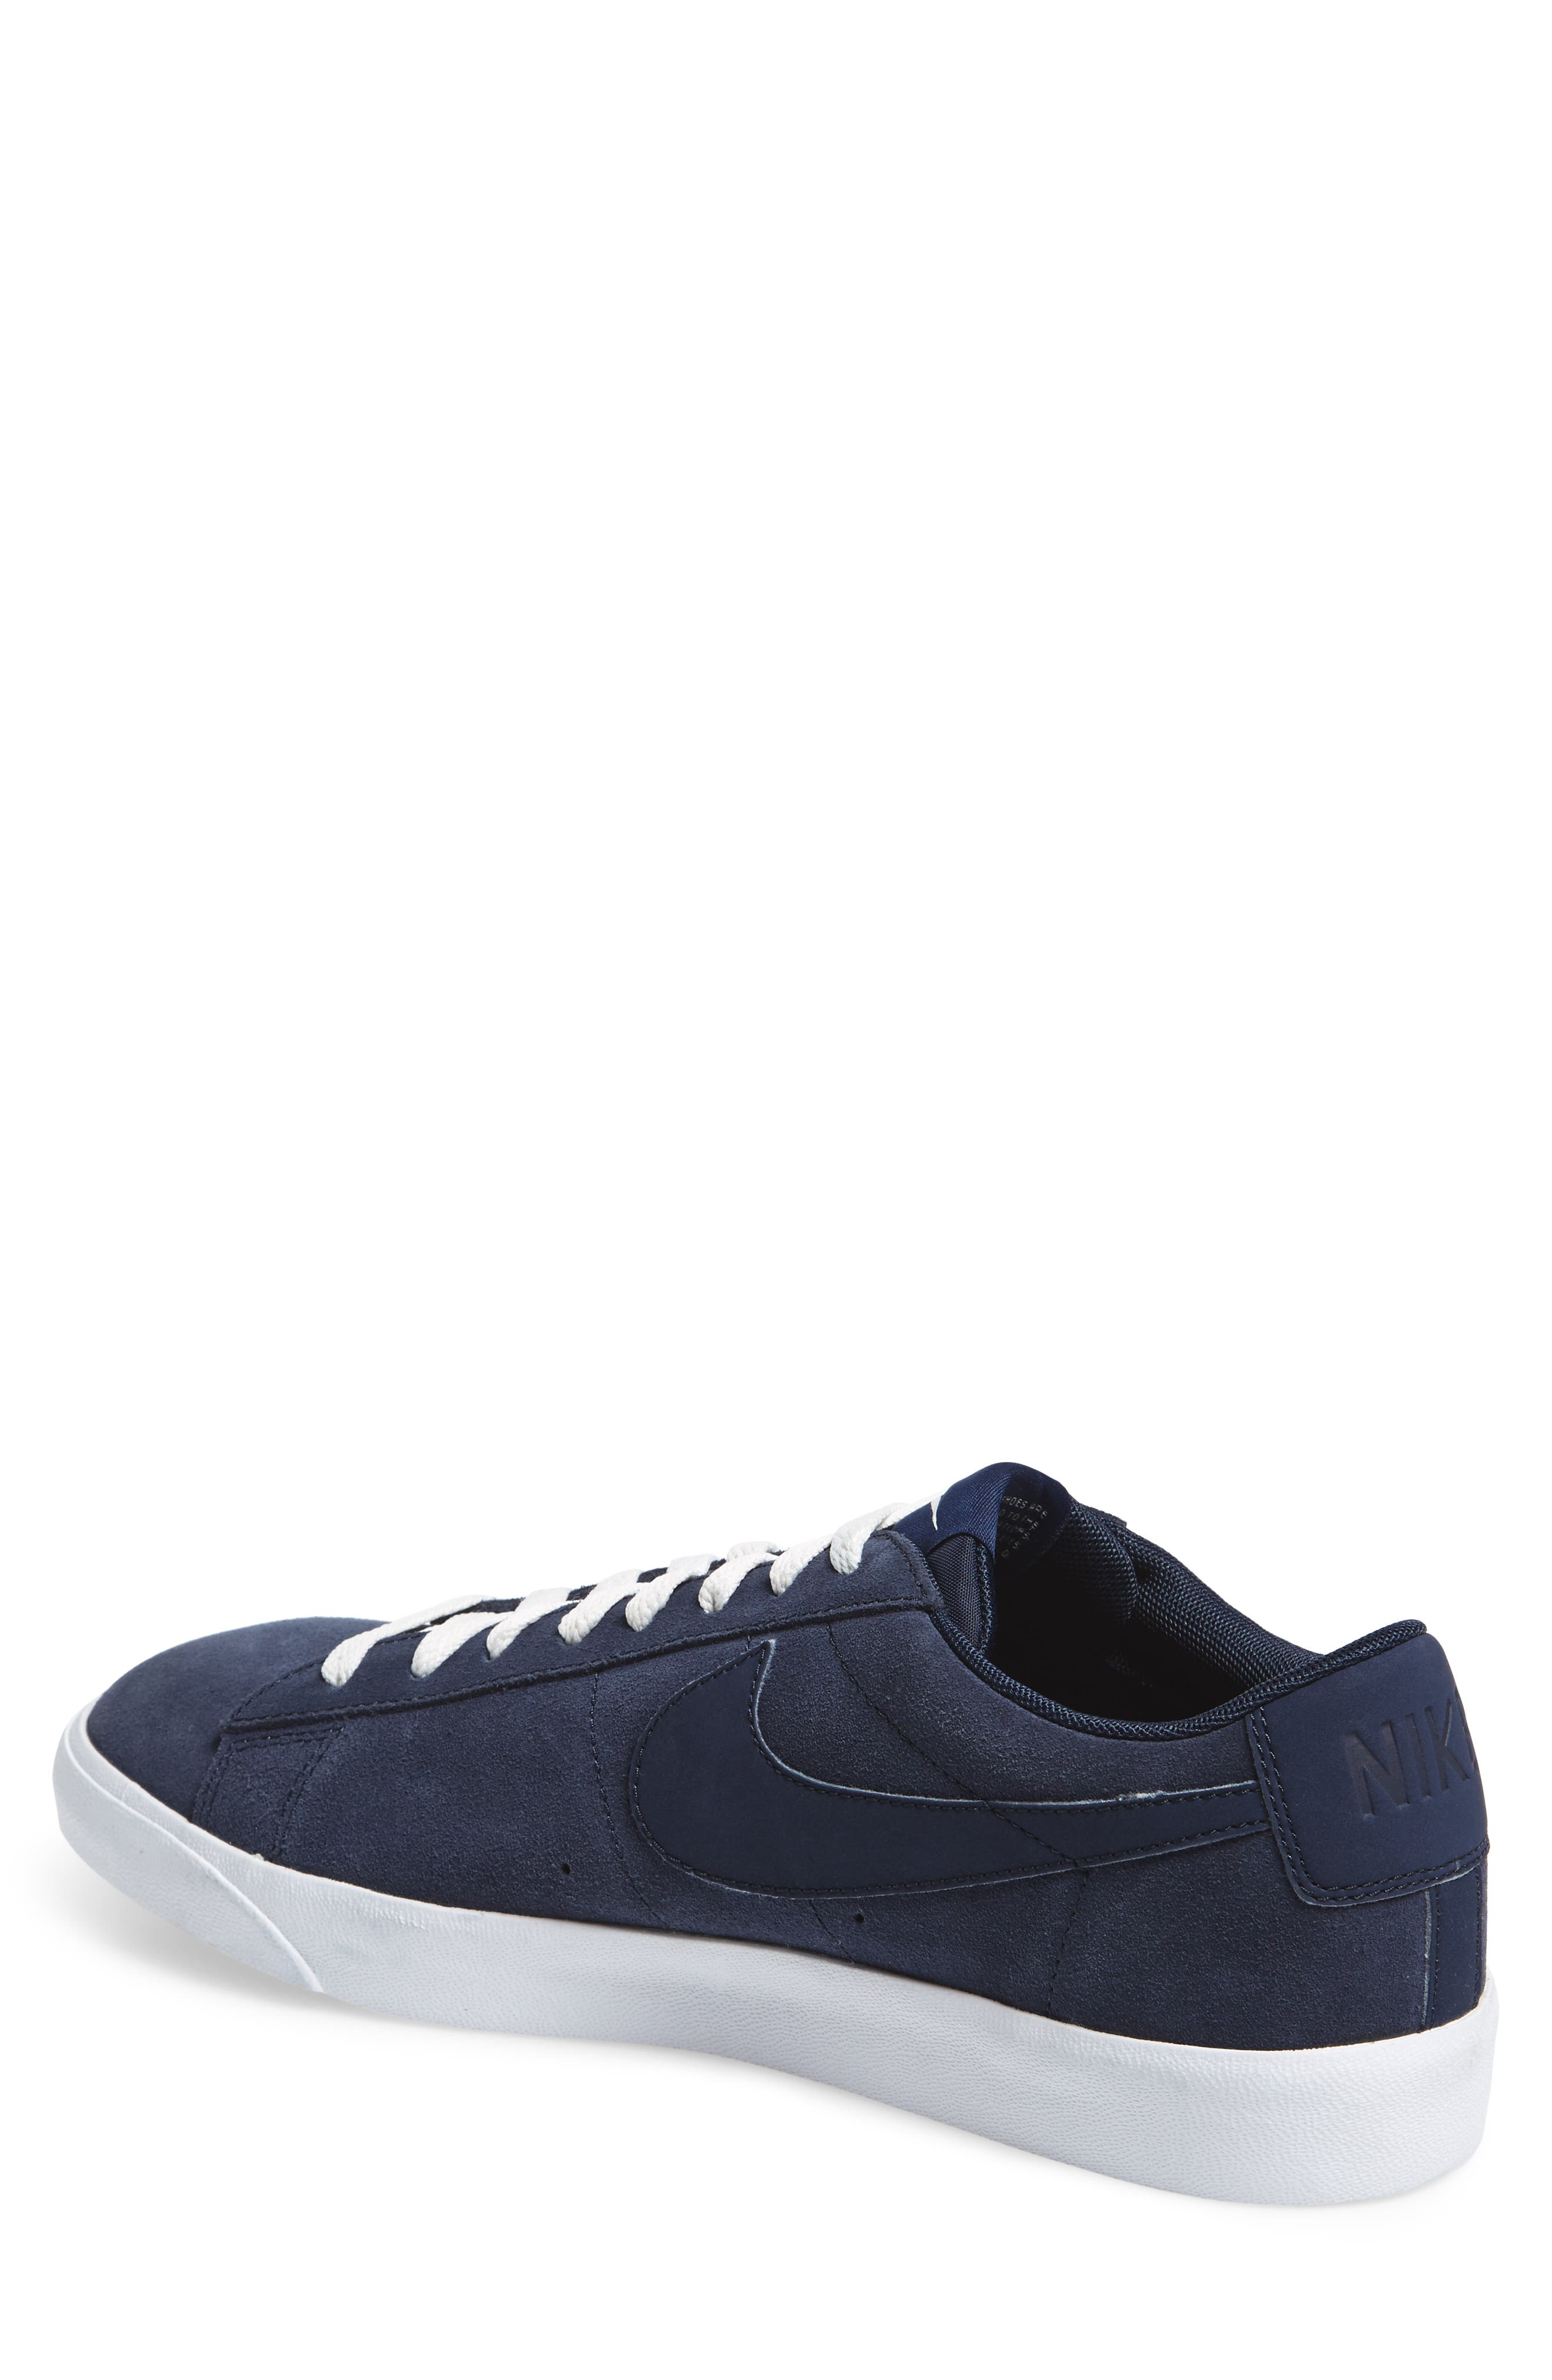 Blazer Low Suede Sneaker,                             Alternate thumbnail 2, color,                             Obsidian/ Sail/ Brown